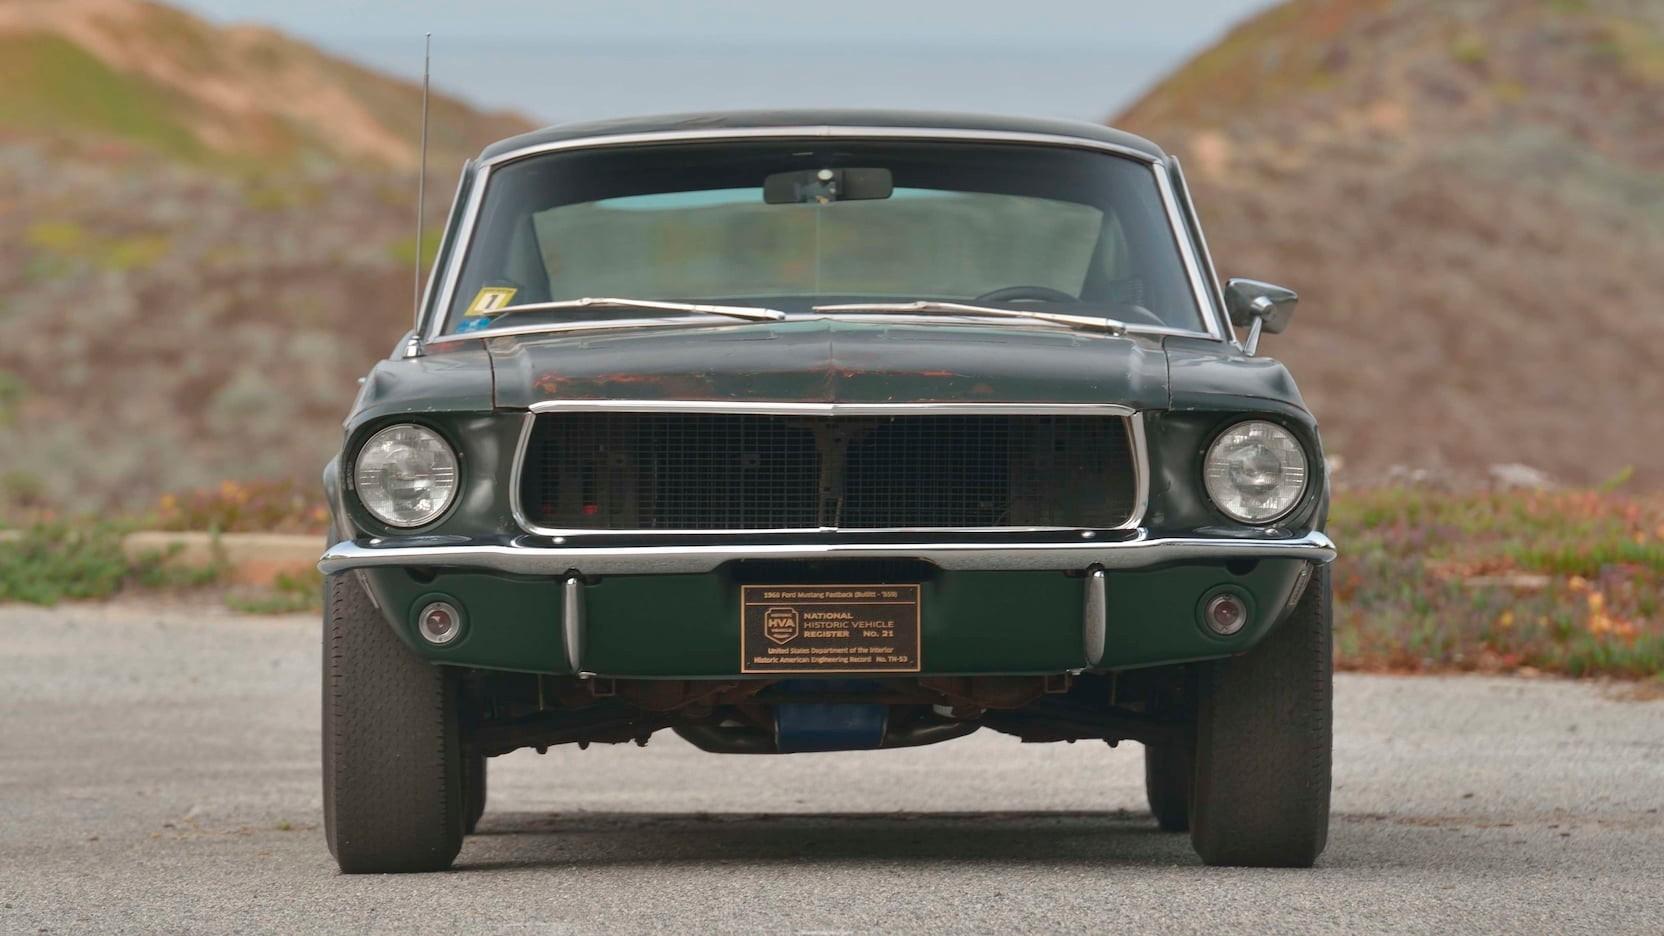 Ford-Mustang-GT-1968-From-Bullitt-auction-7